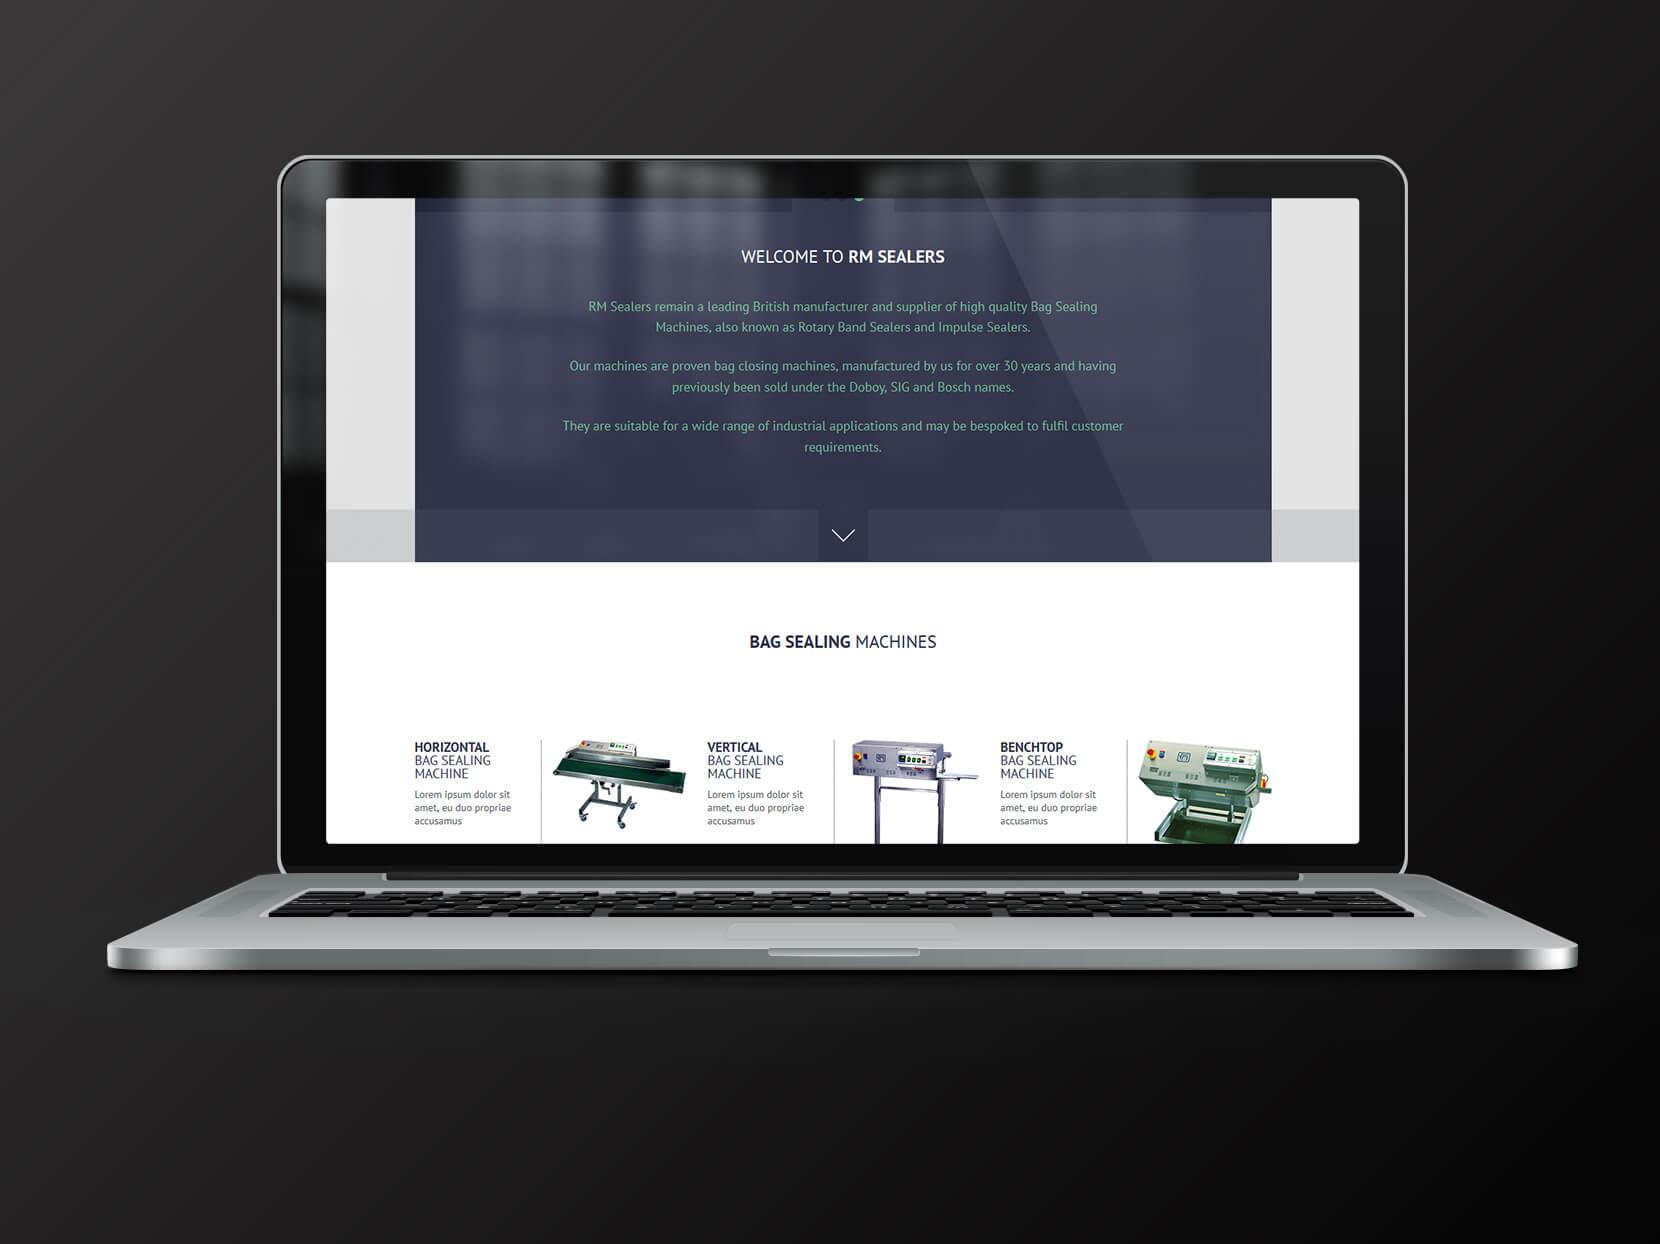 New bag Sealing Machine Website